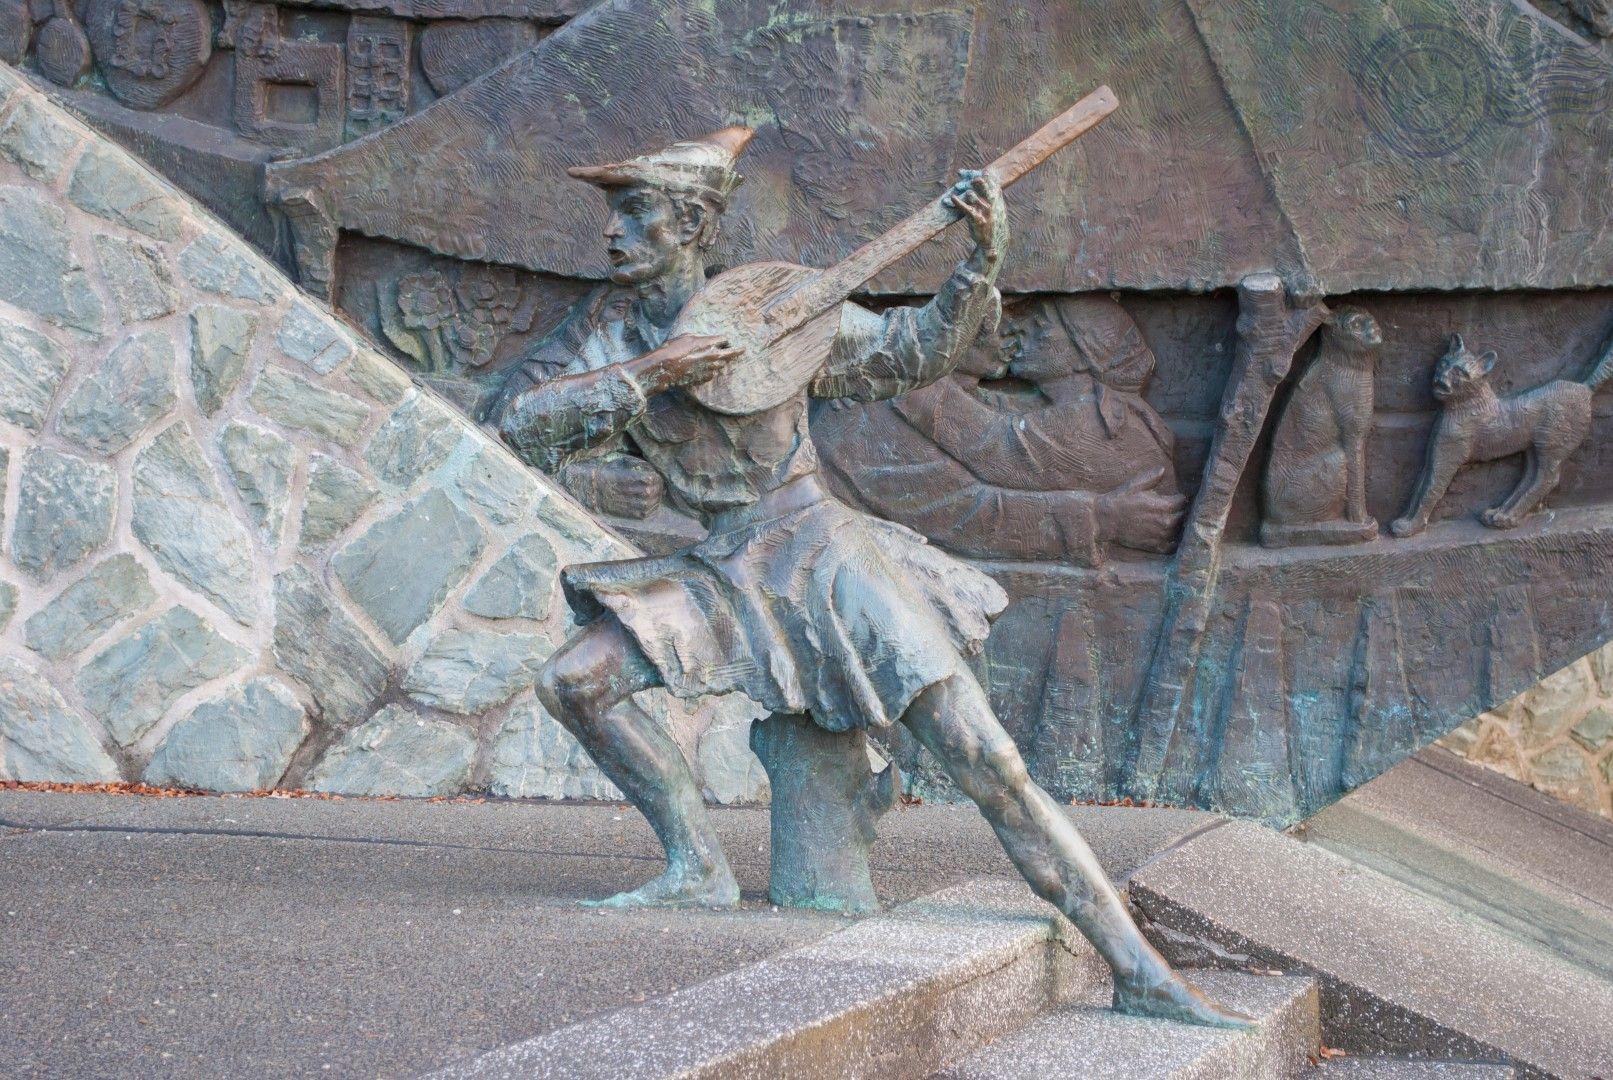 Spomenik Matiji gupcu, stubica, kerempuh